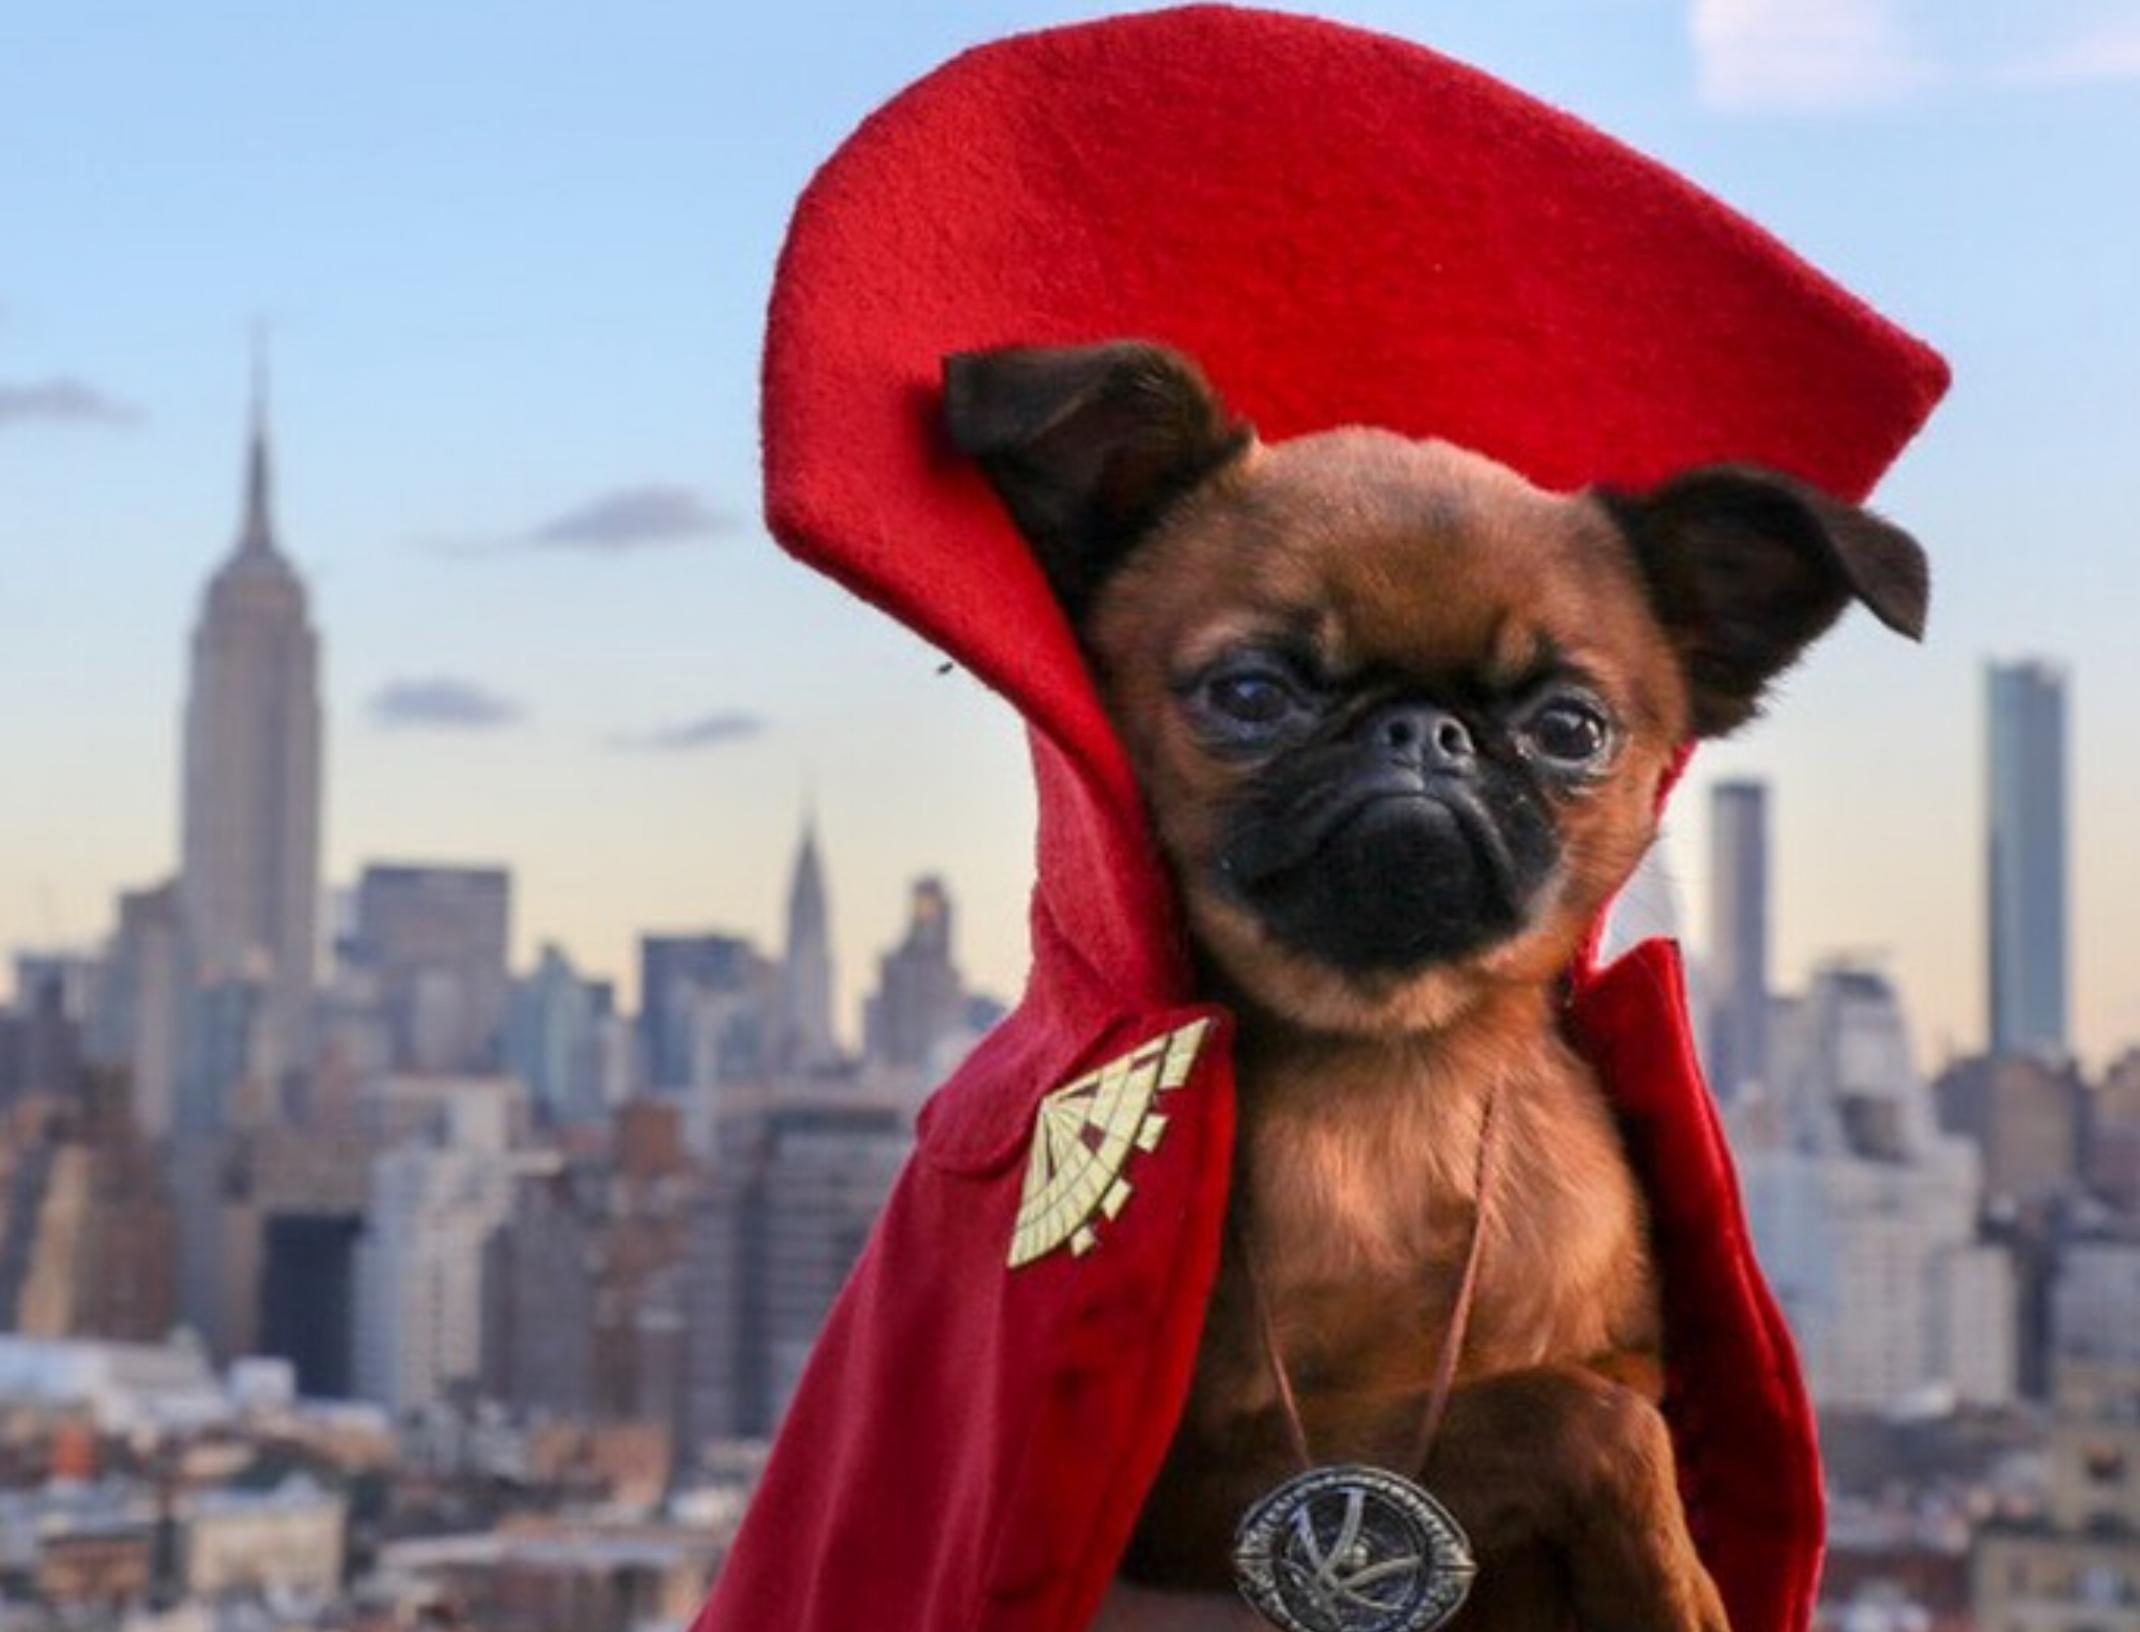 Marvel Studios x Dogtor Strange